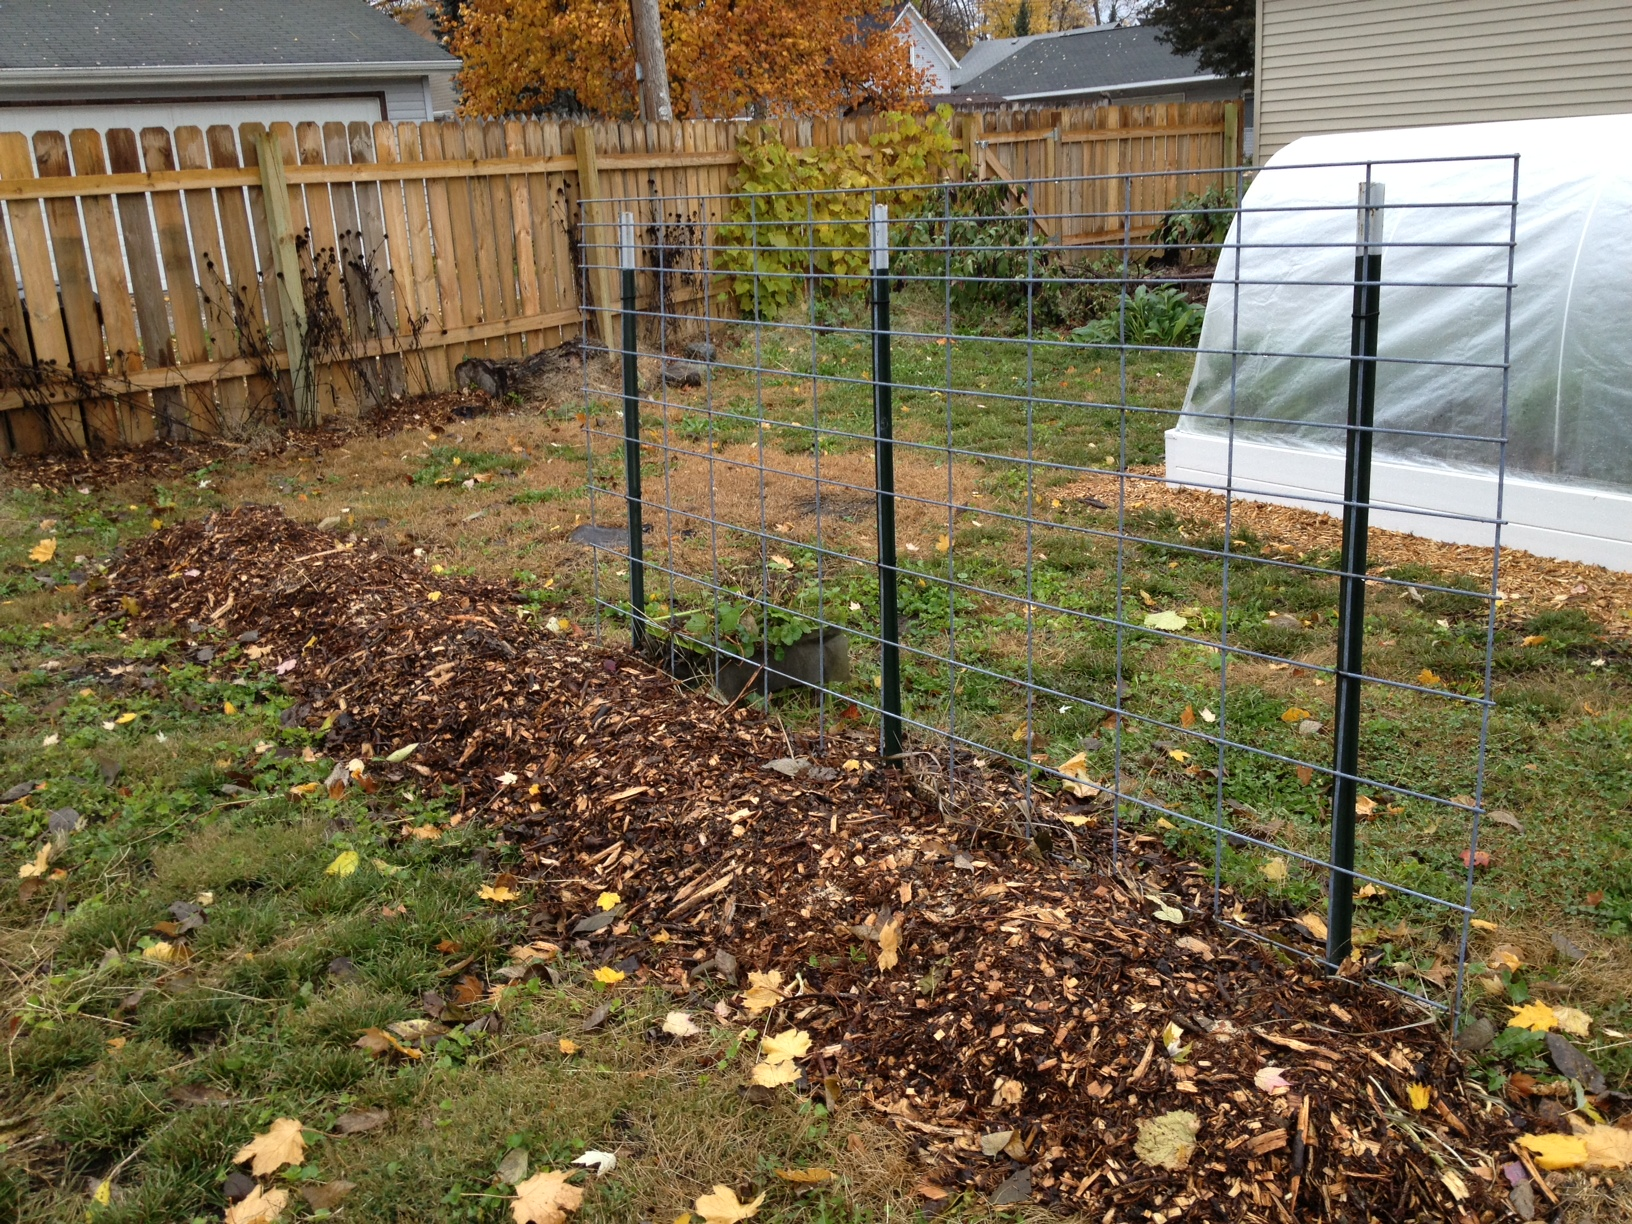 Horizontal Kale and Other Gardening Fun | Laura Bruno\'s Blog